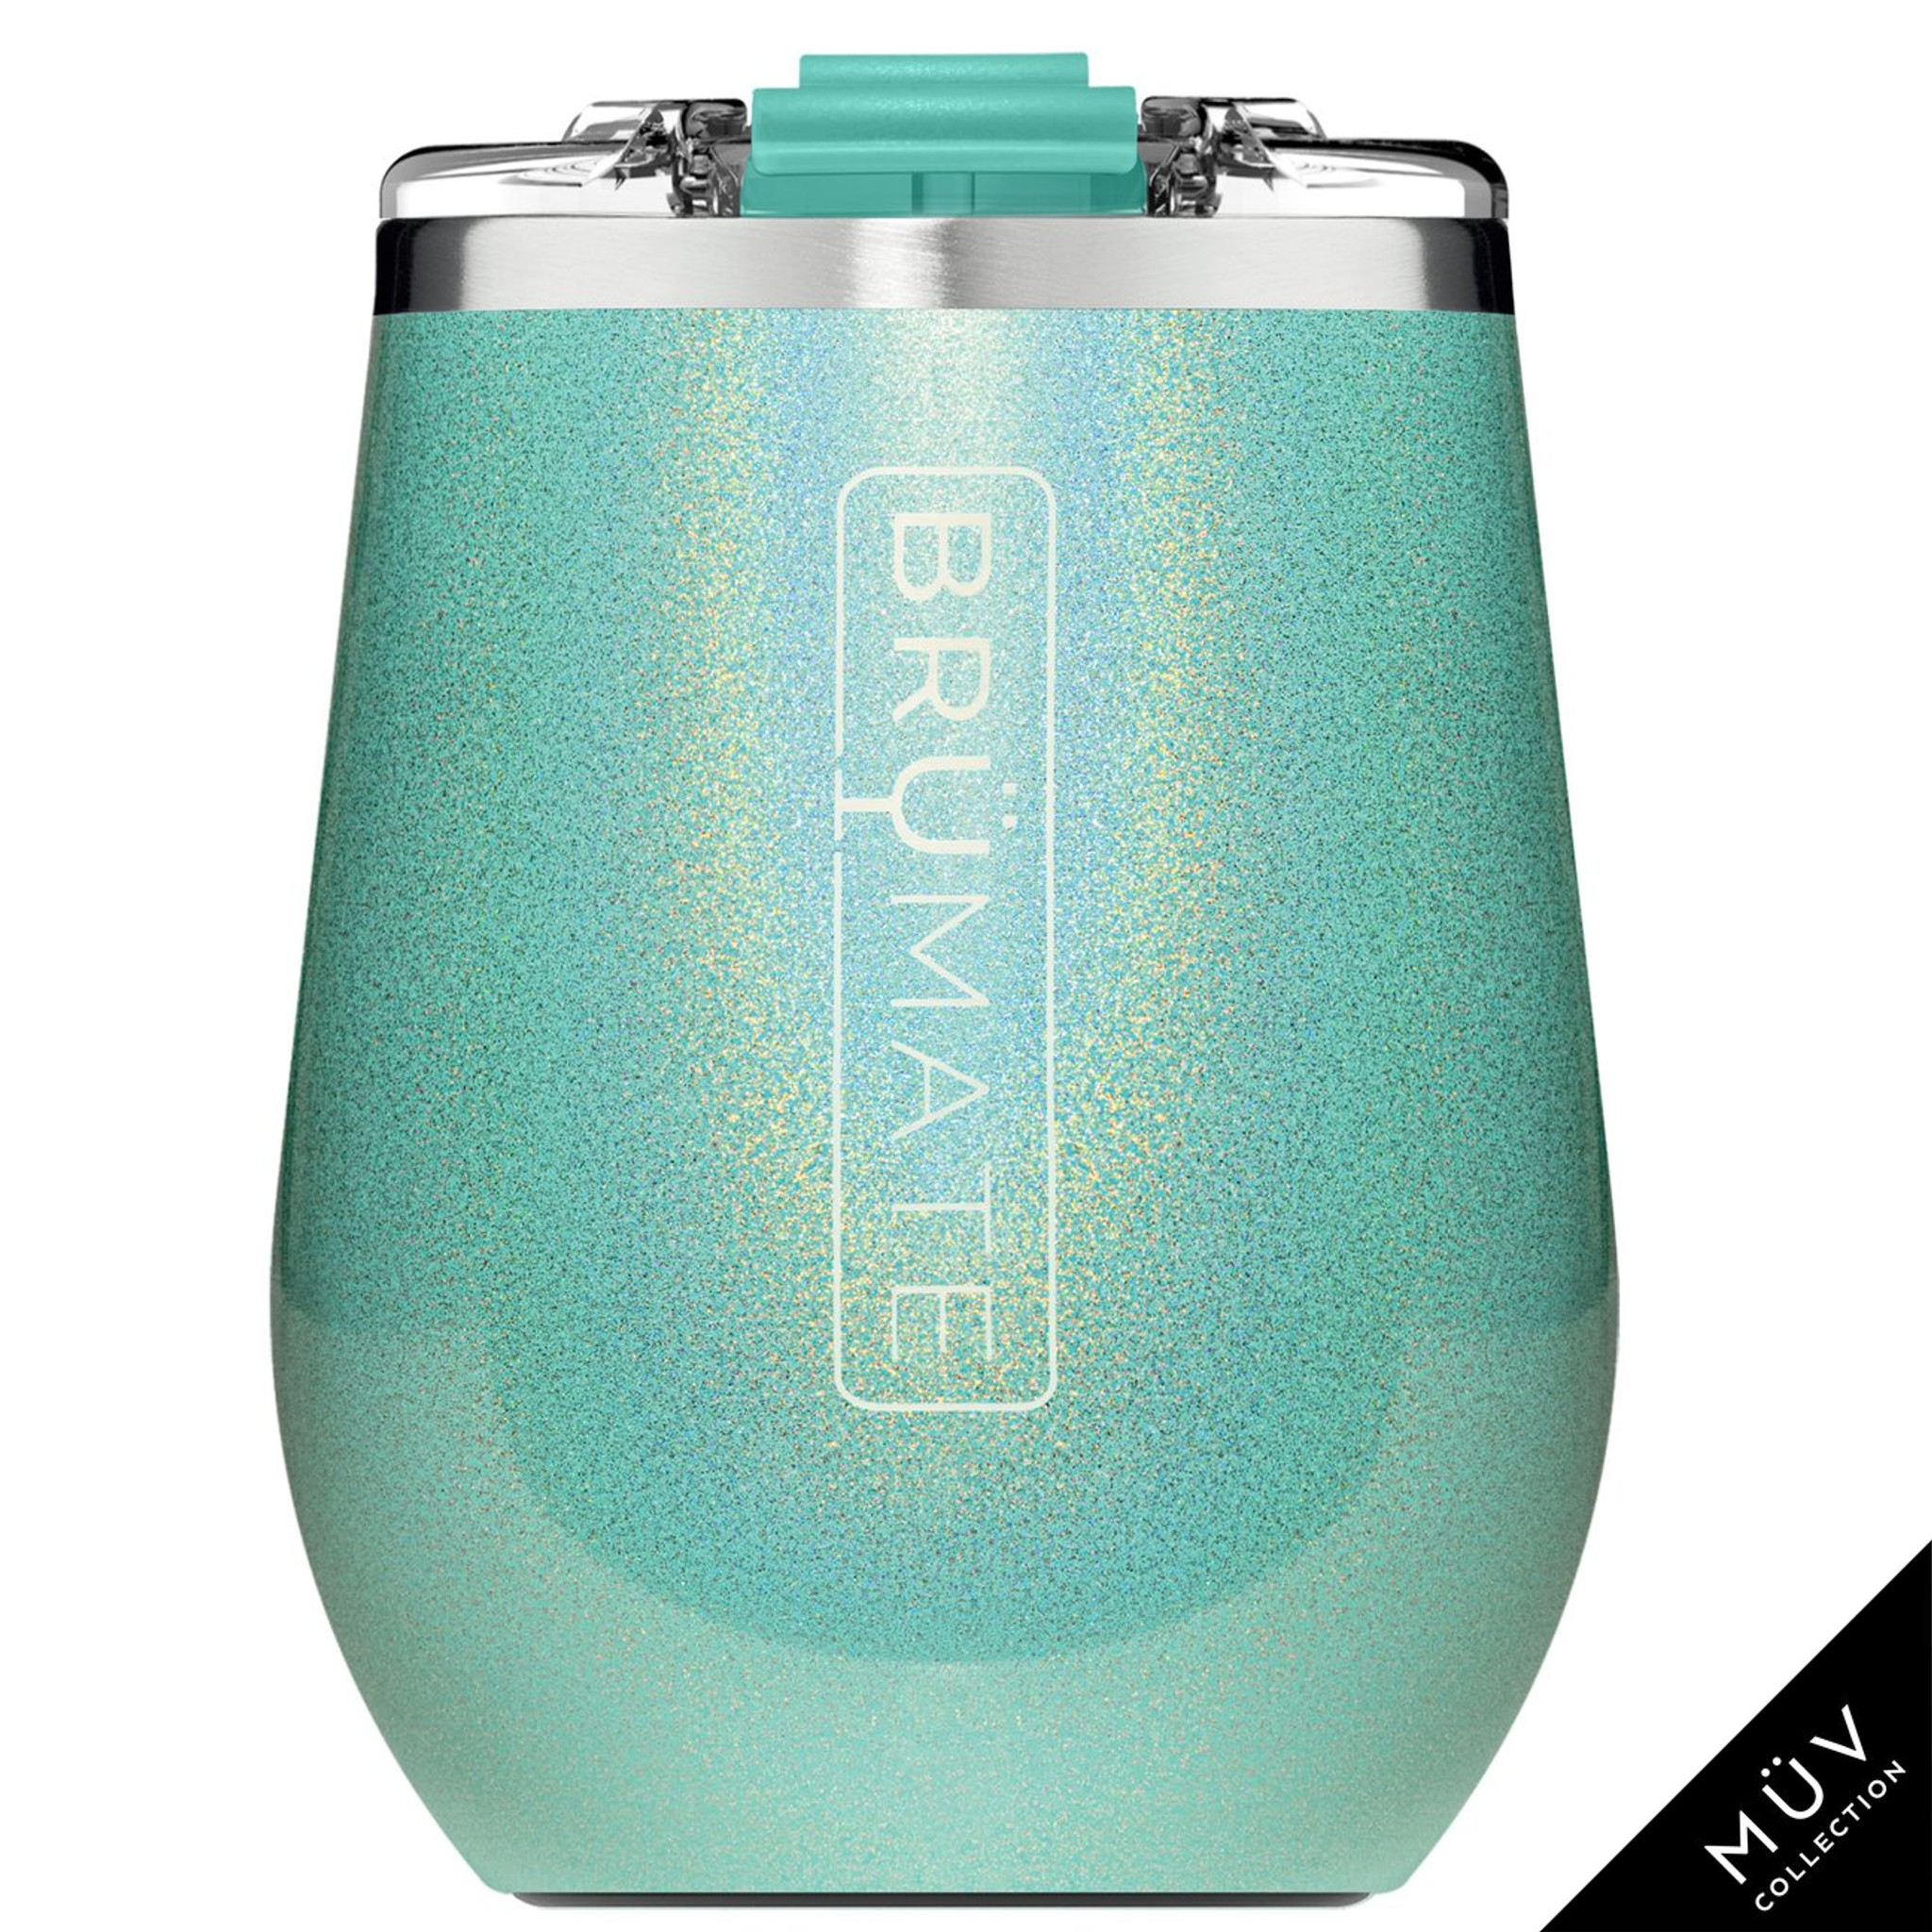 Brumate MuV Wine Tumbler - Glitter Aqua